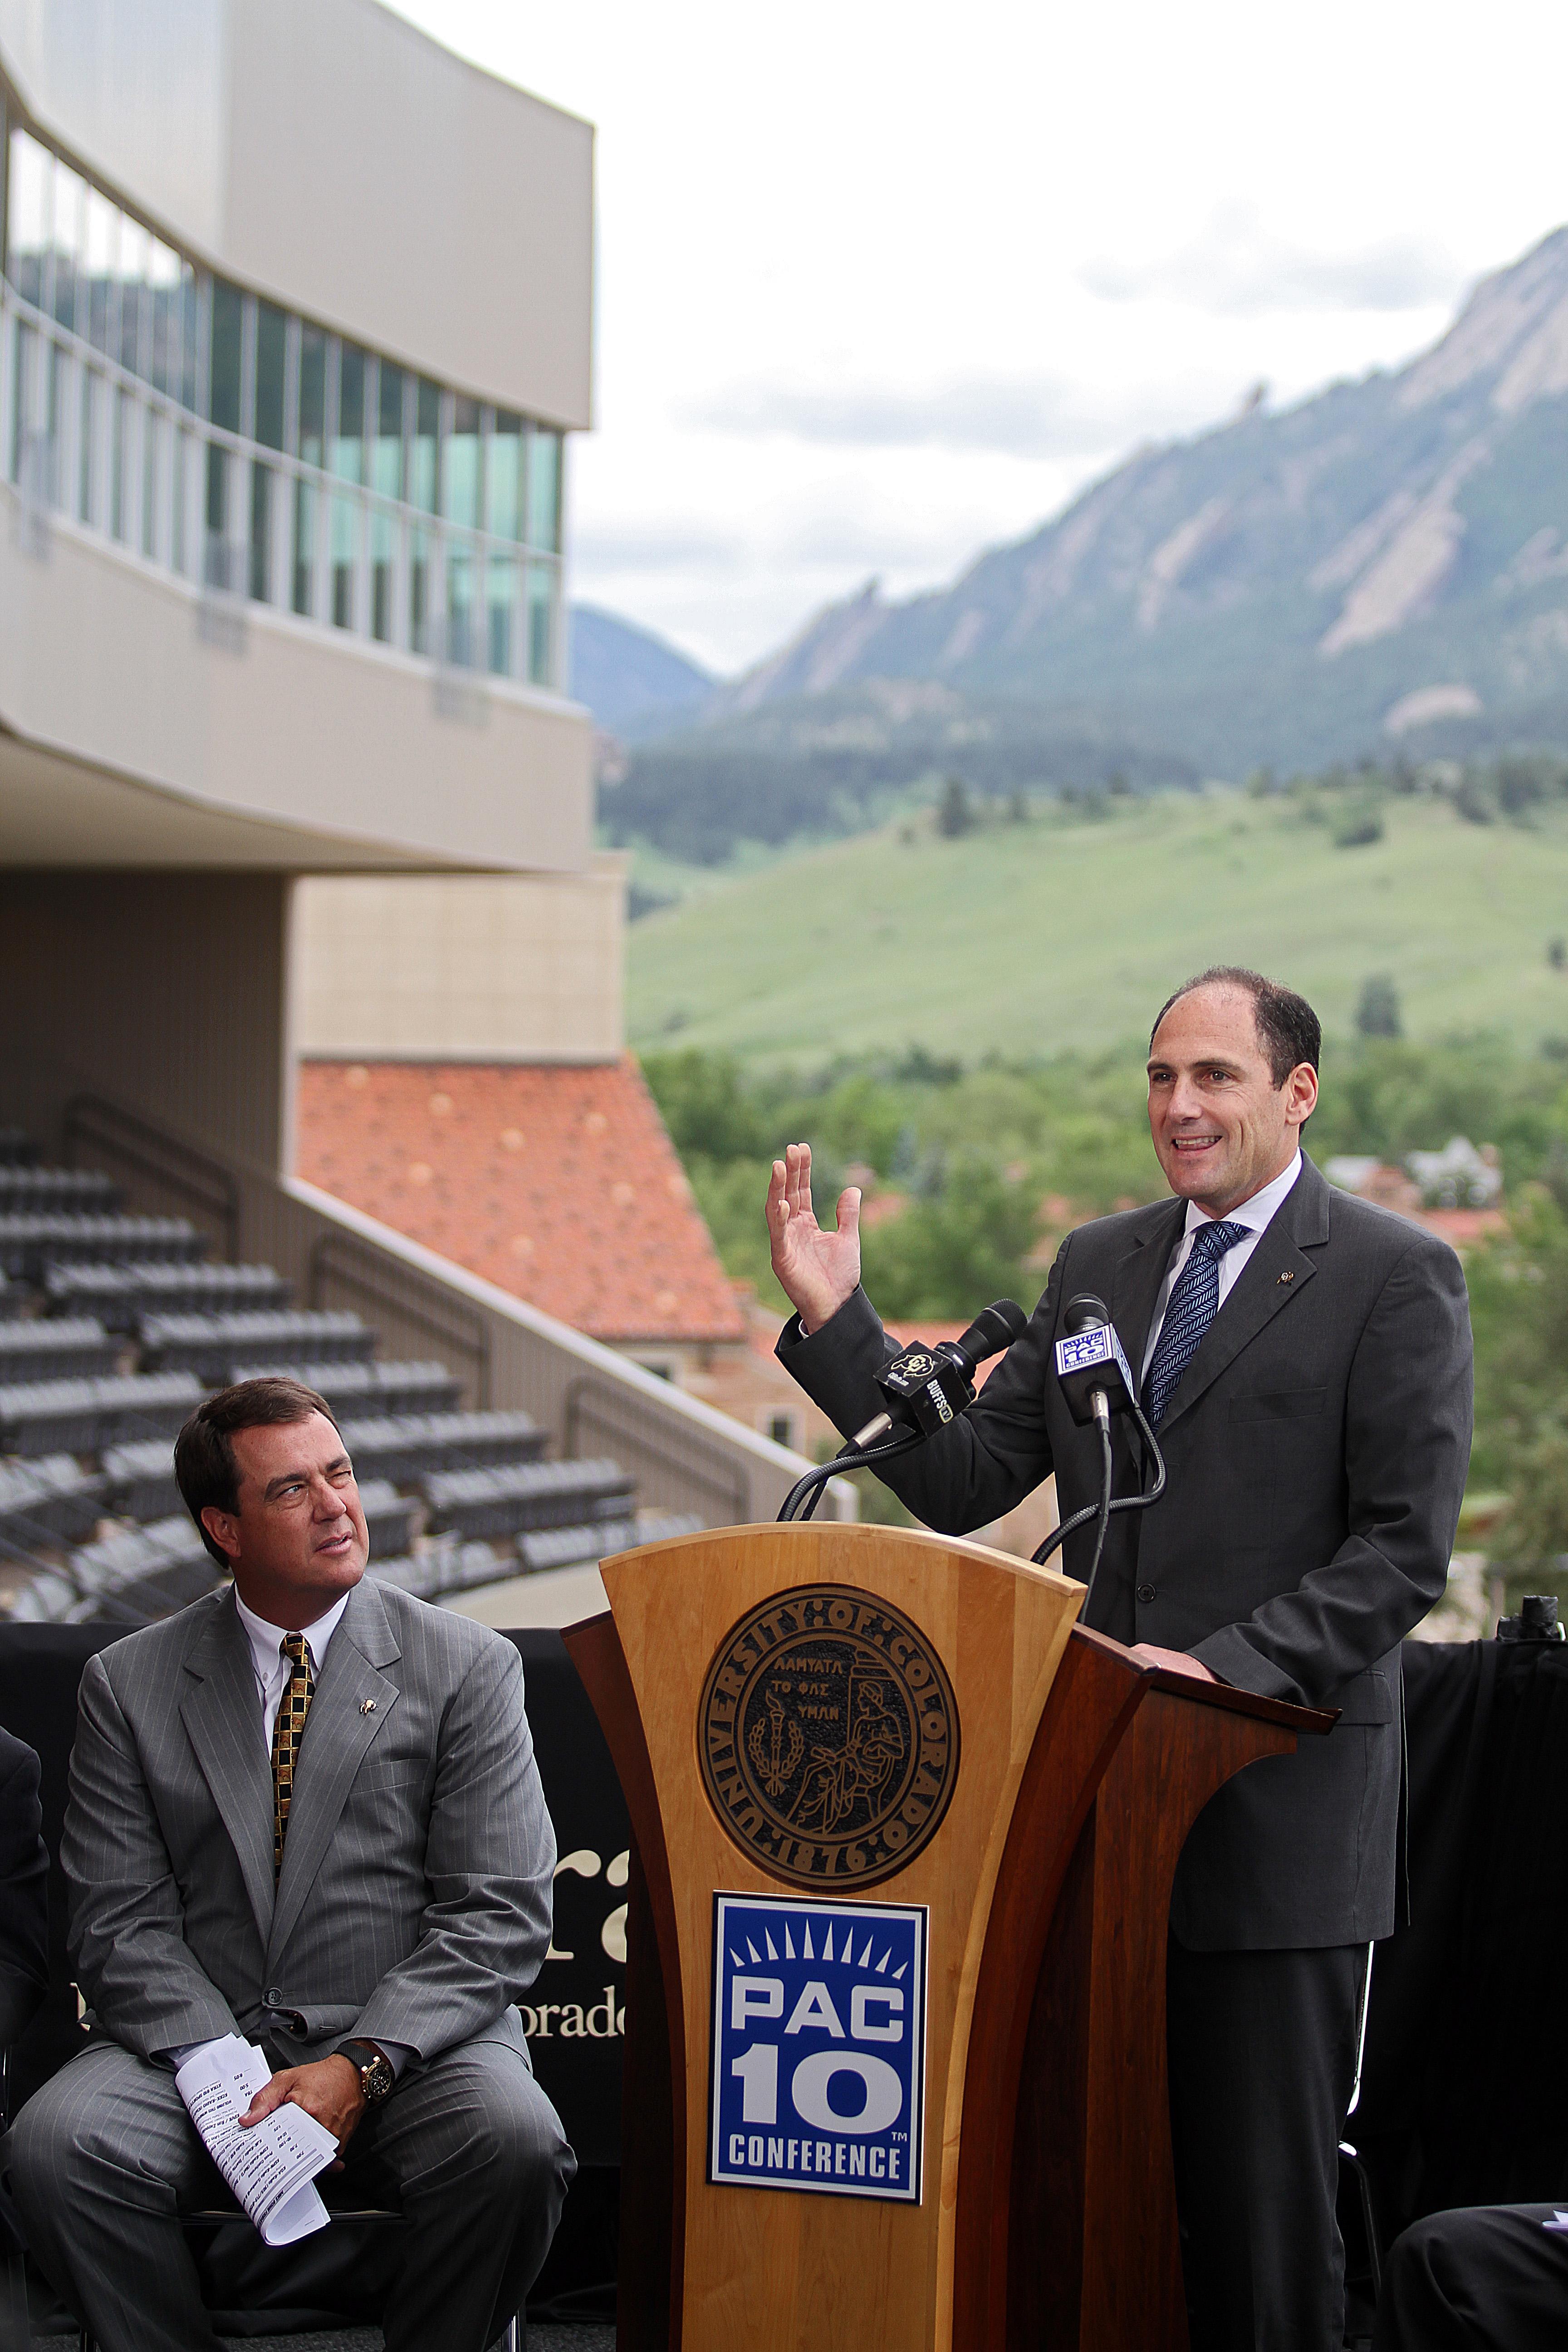 BOULDER, CO - JUNE 11:  University of Colorado Athletic Director Mike Bohn (L) listens as  PAC-10 Commissioner Larry Scott speaks during a press conference at Folsom Stadium on June 11, 2010 in Boulder, Colorado. The University of Colorado Board of Regent